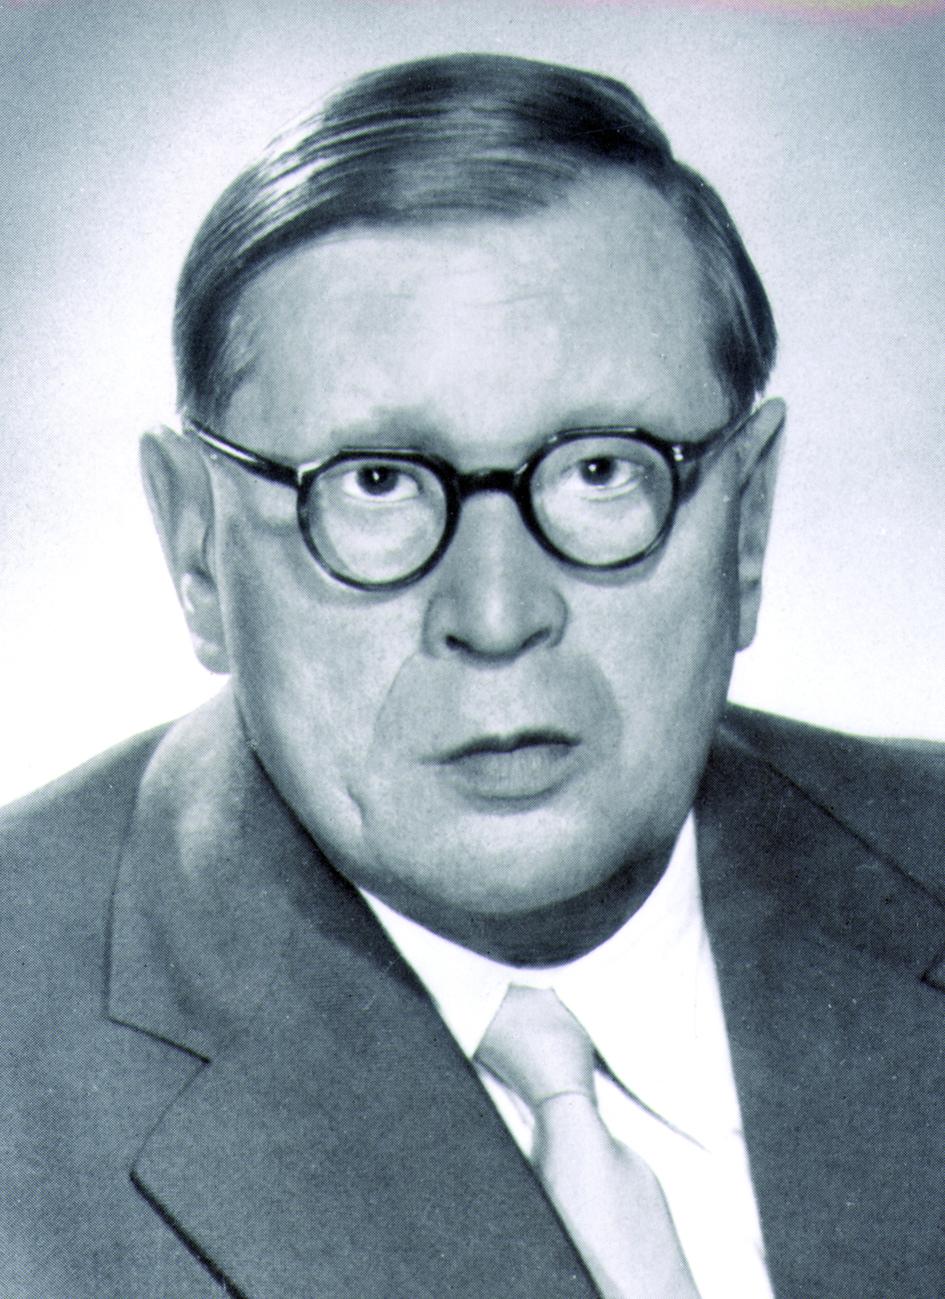 Portraitfoto von Herrn Robert Janker.